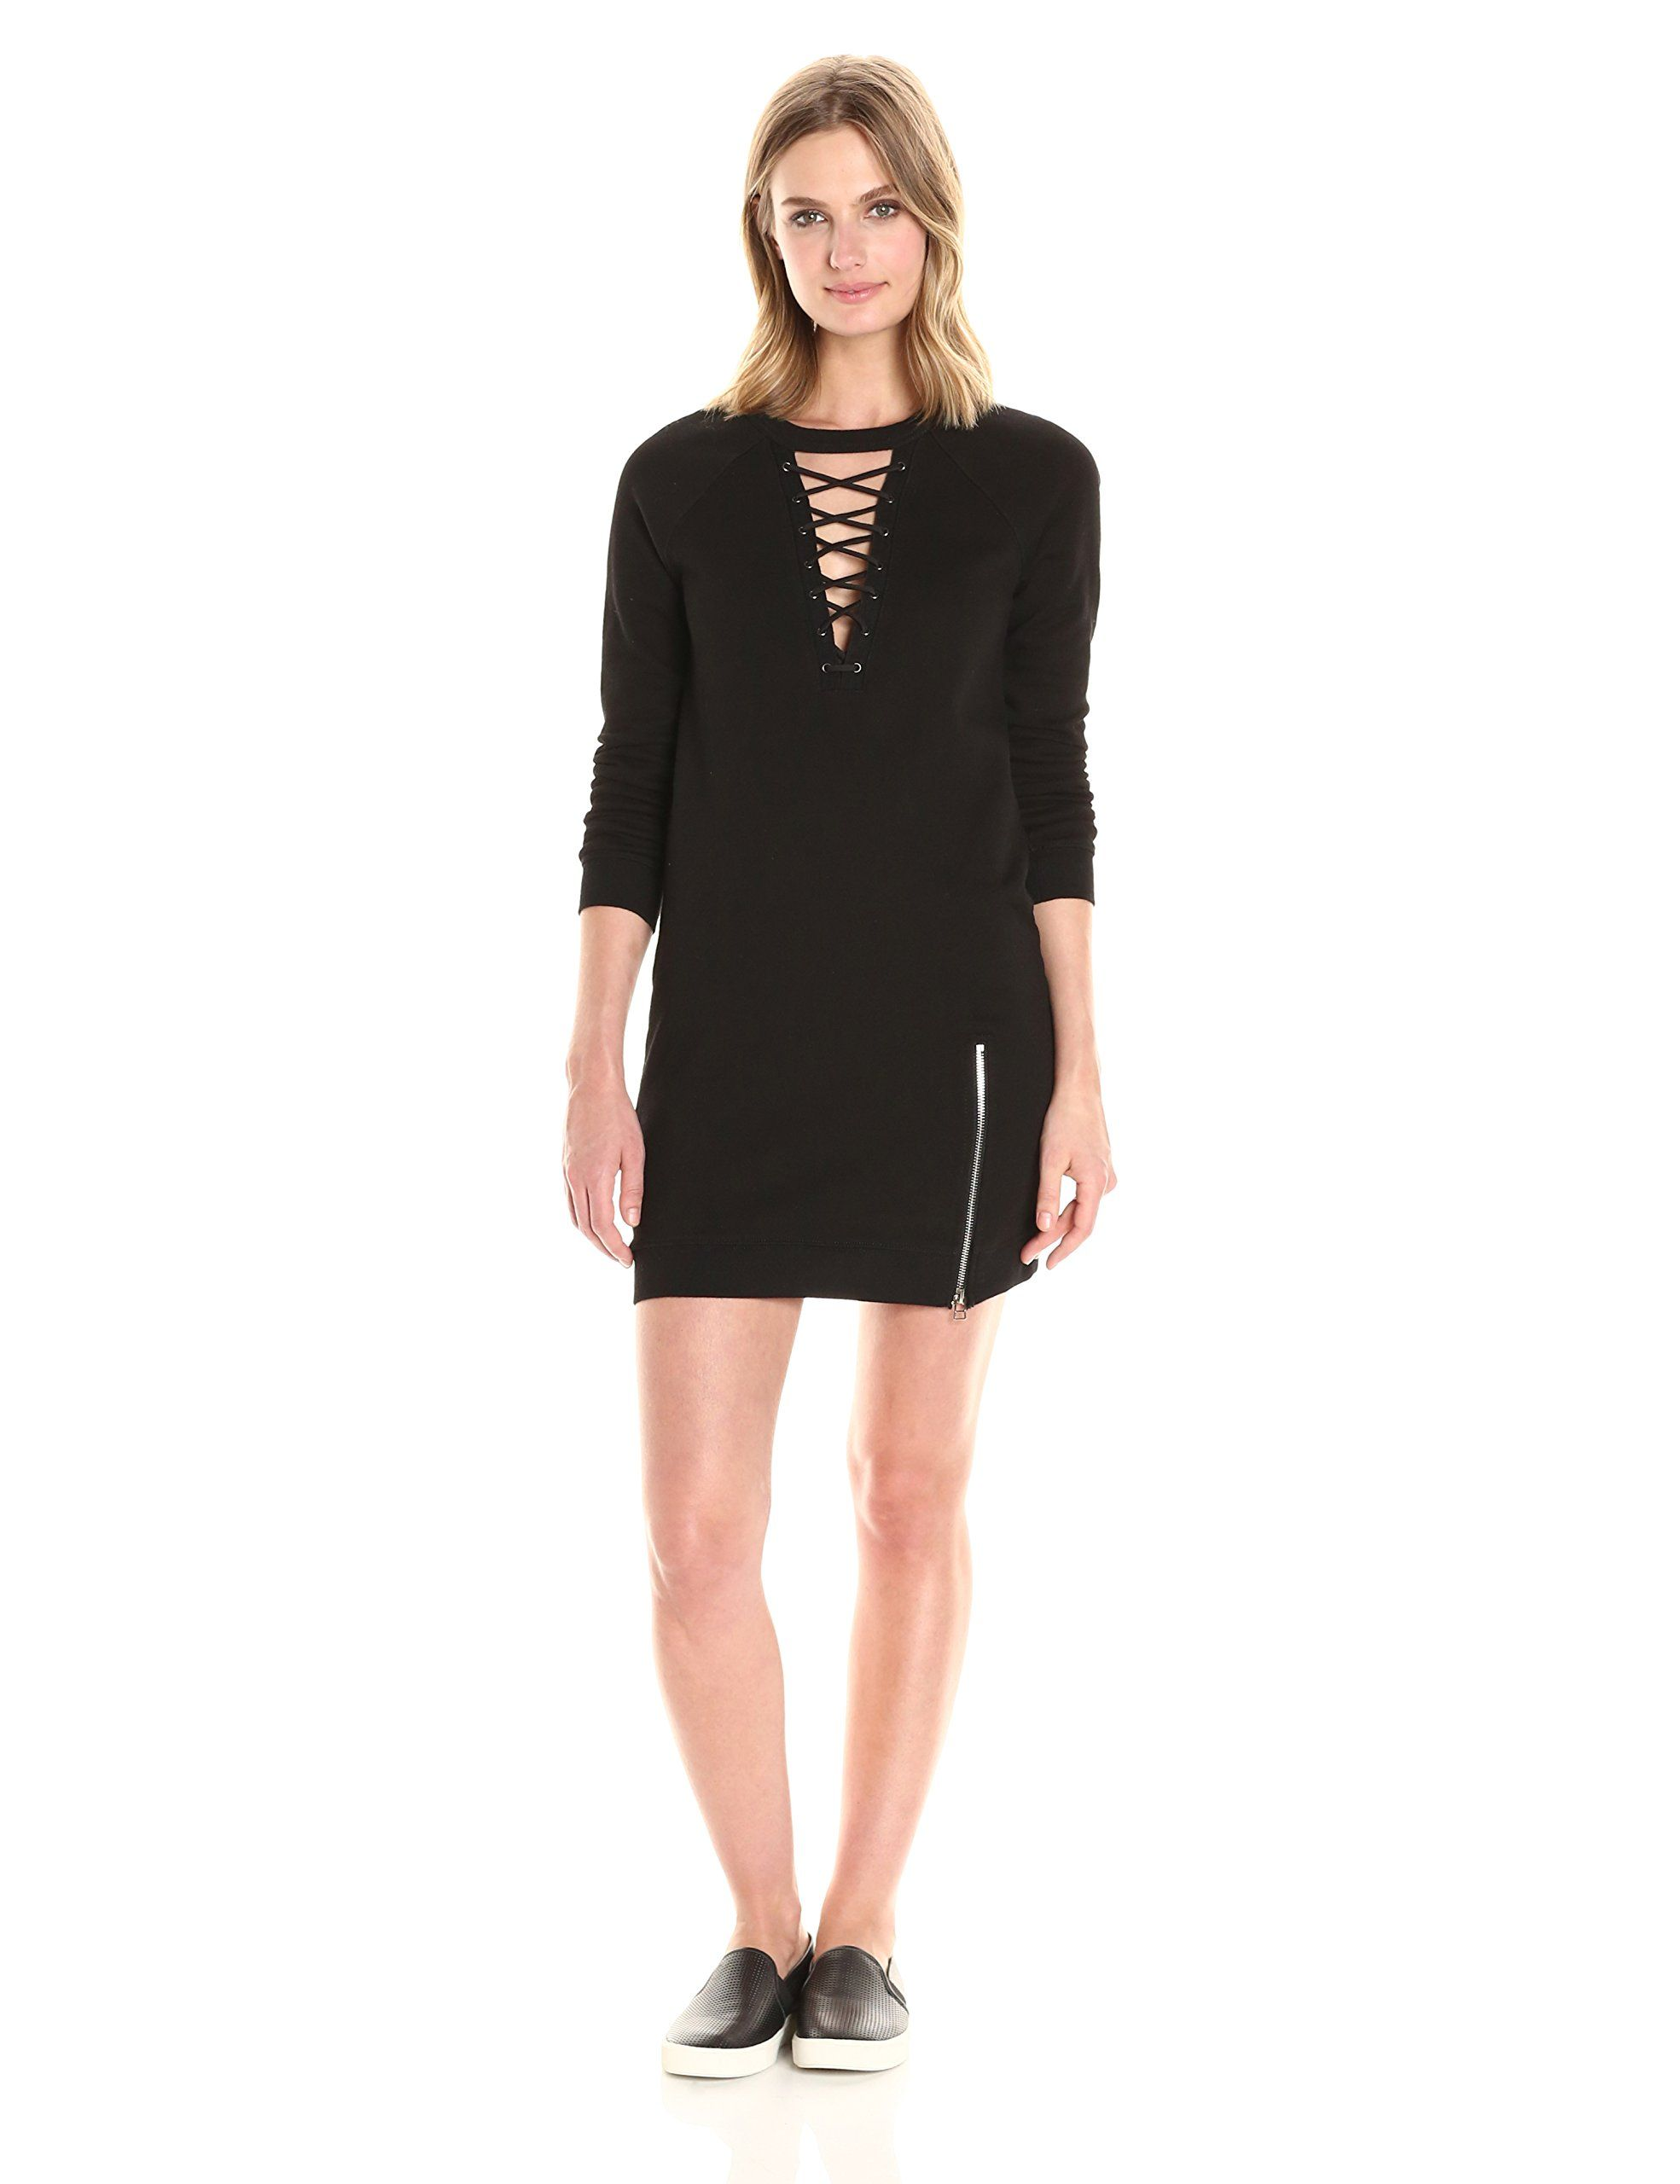 Pam u gela womenus choker lace up dress black m zipper detail at